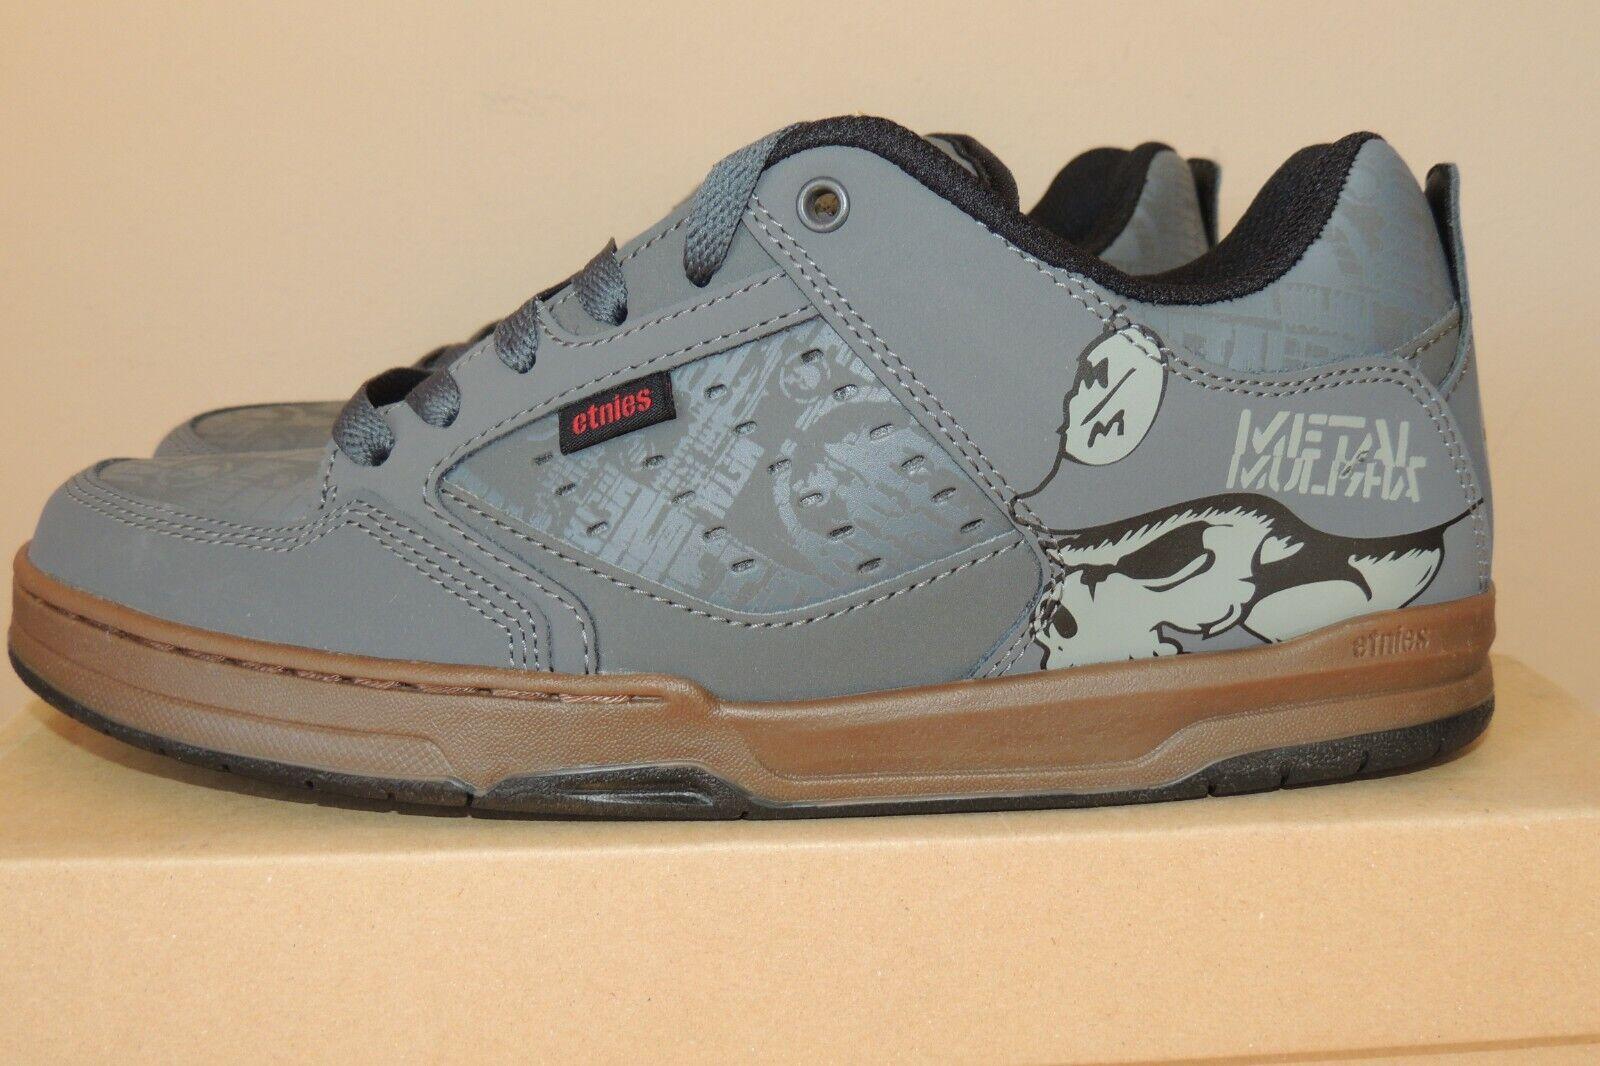 metal mulisha etnies shoes